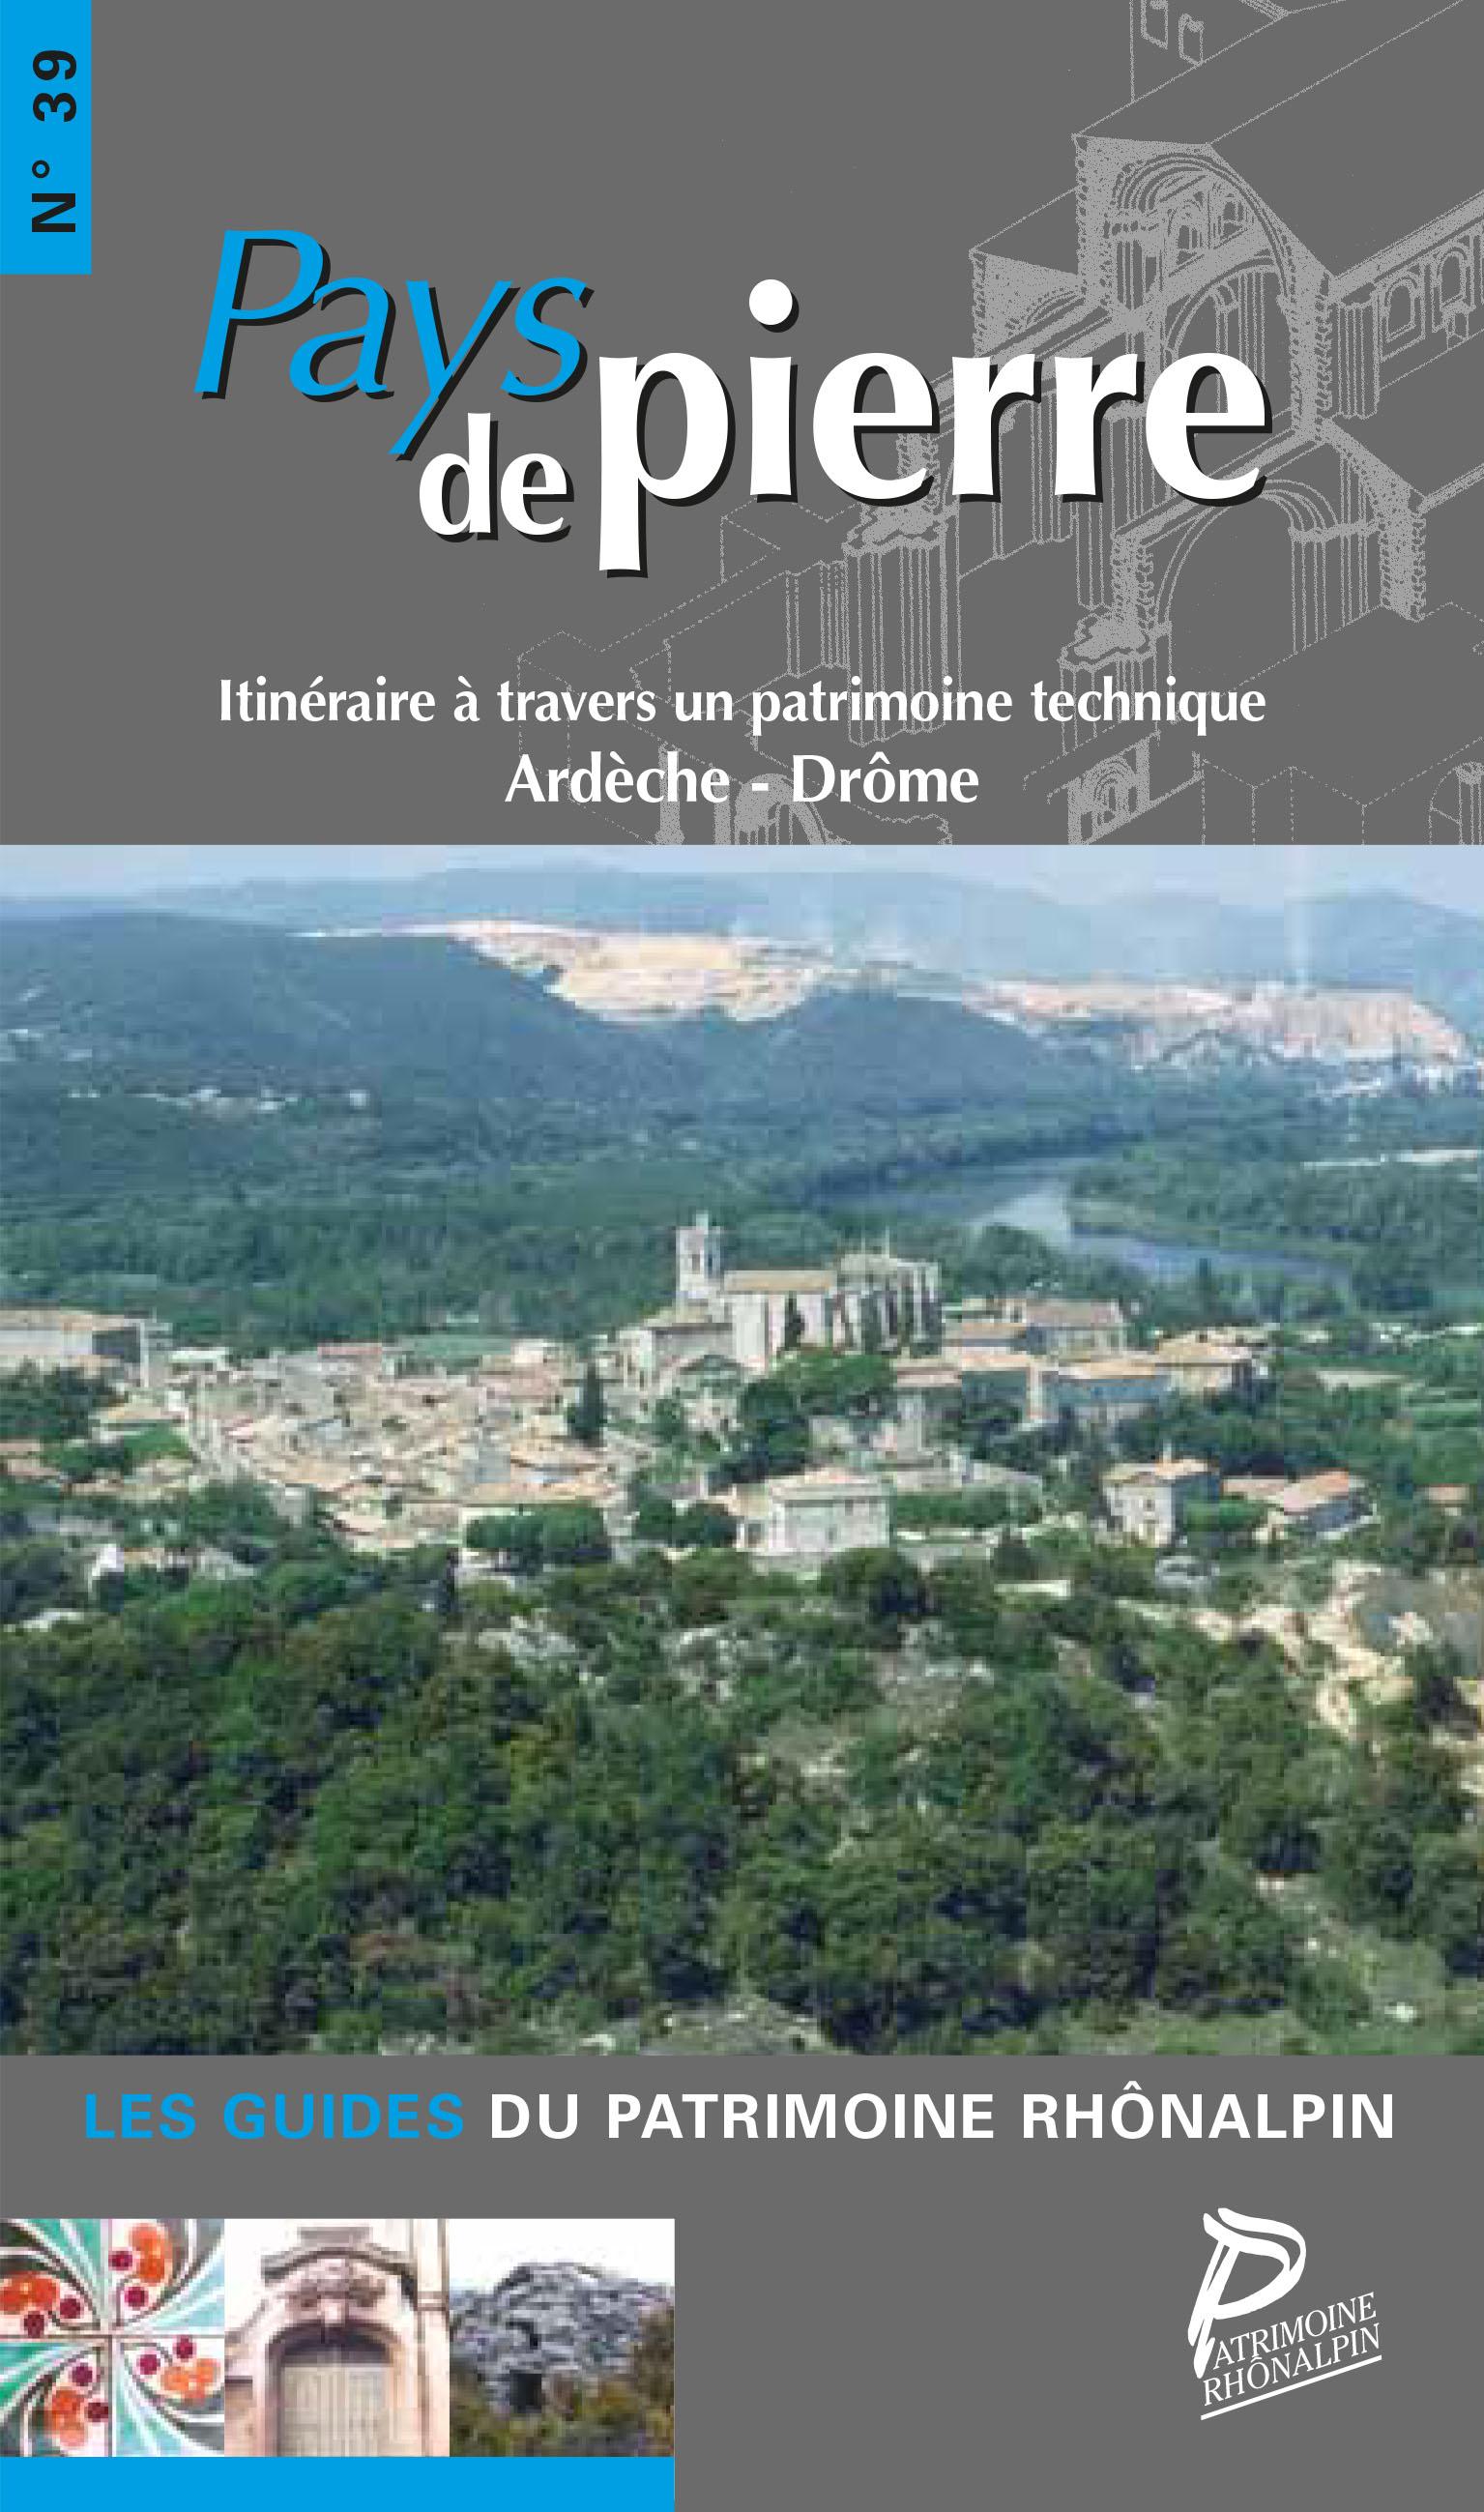 Guide n°39 – Pays de pierre